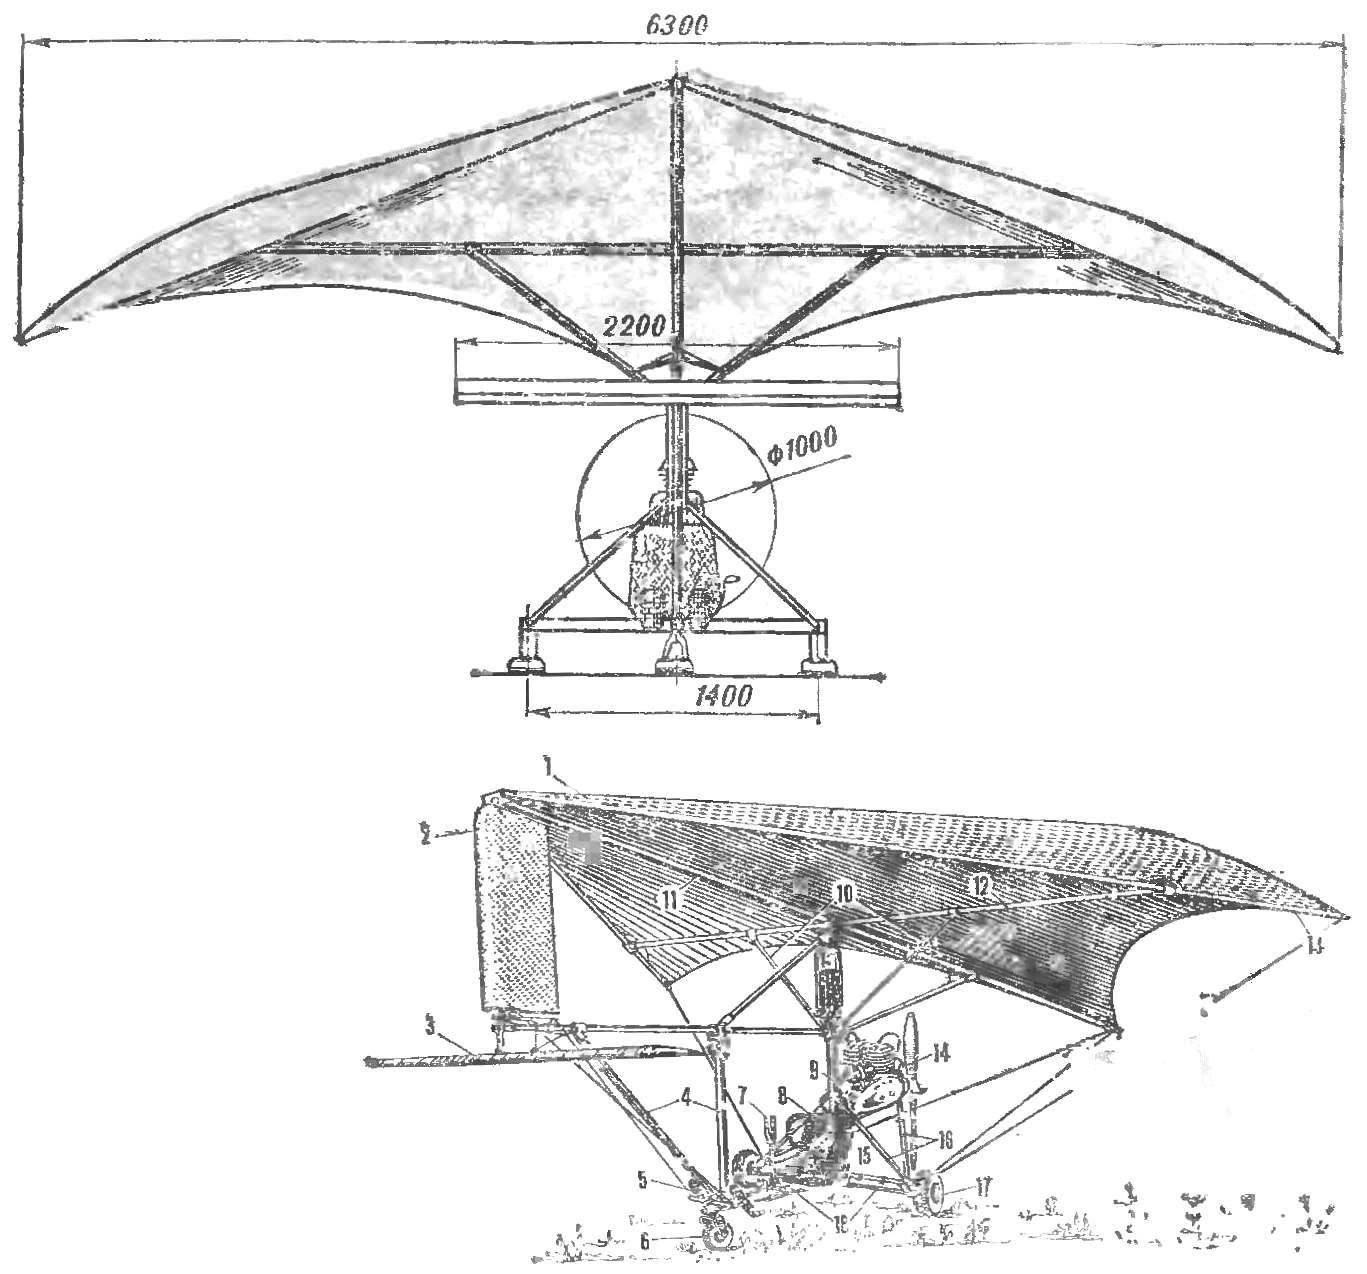 Рис. 2. Общий вид мотодельтаплана БС-3 конструкции С. Беликова